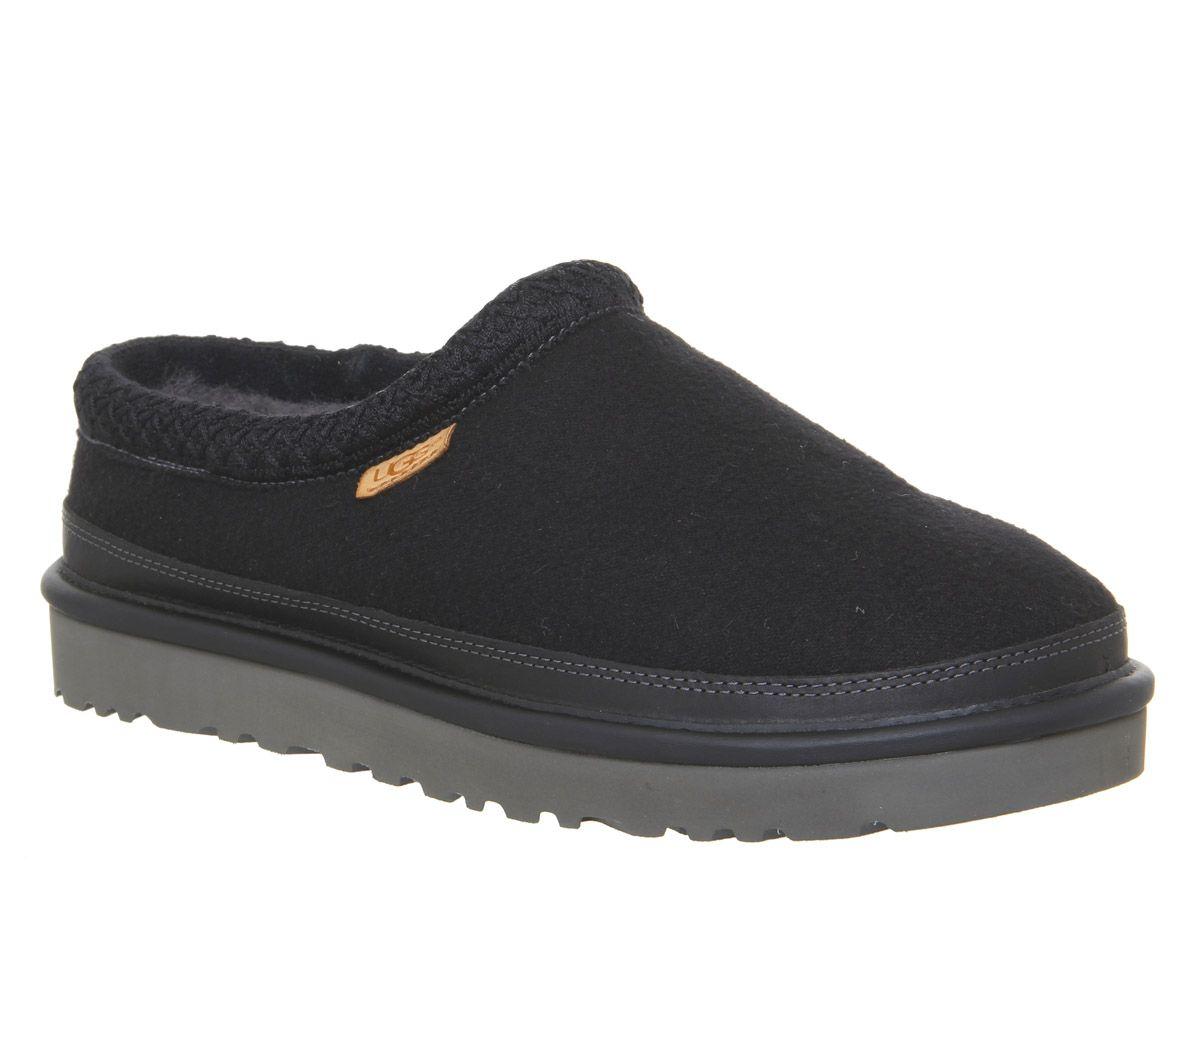 d0354ebe954 Tasman Slippers